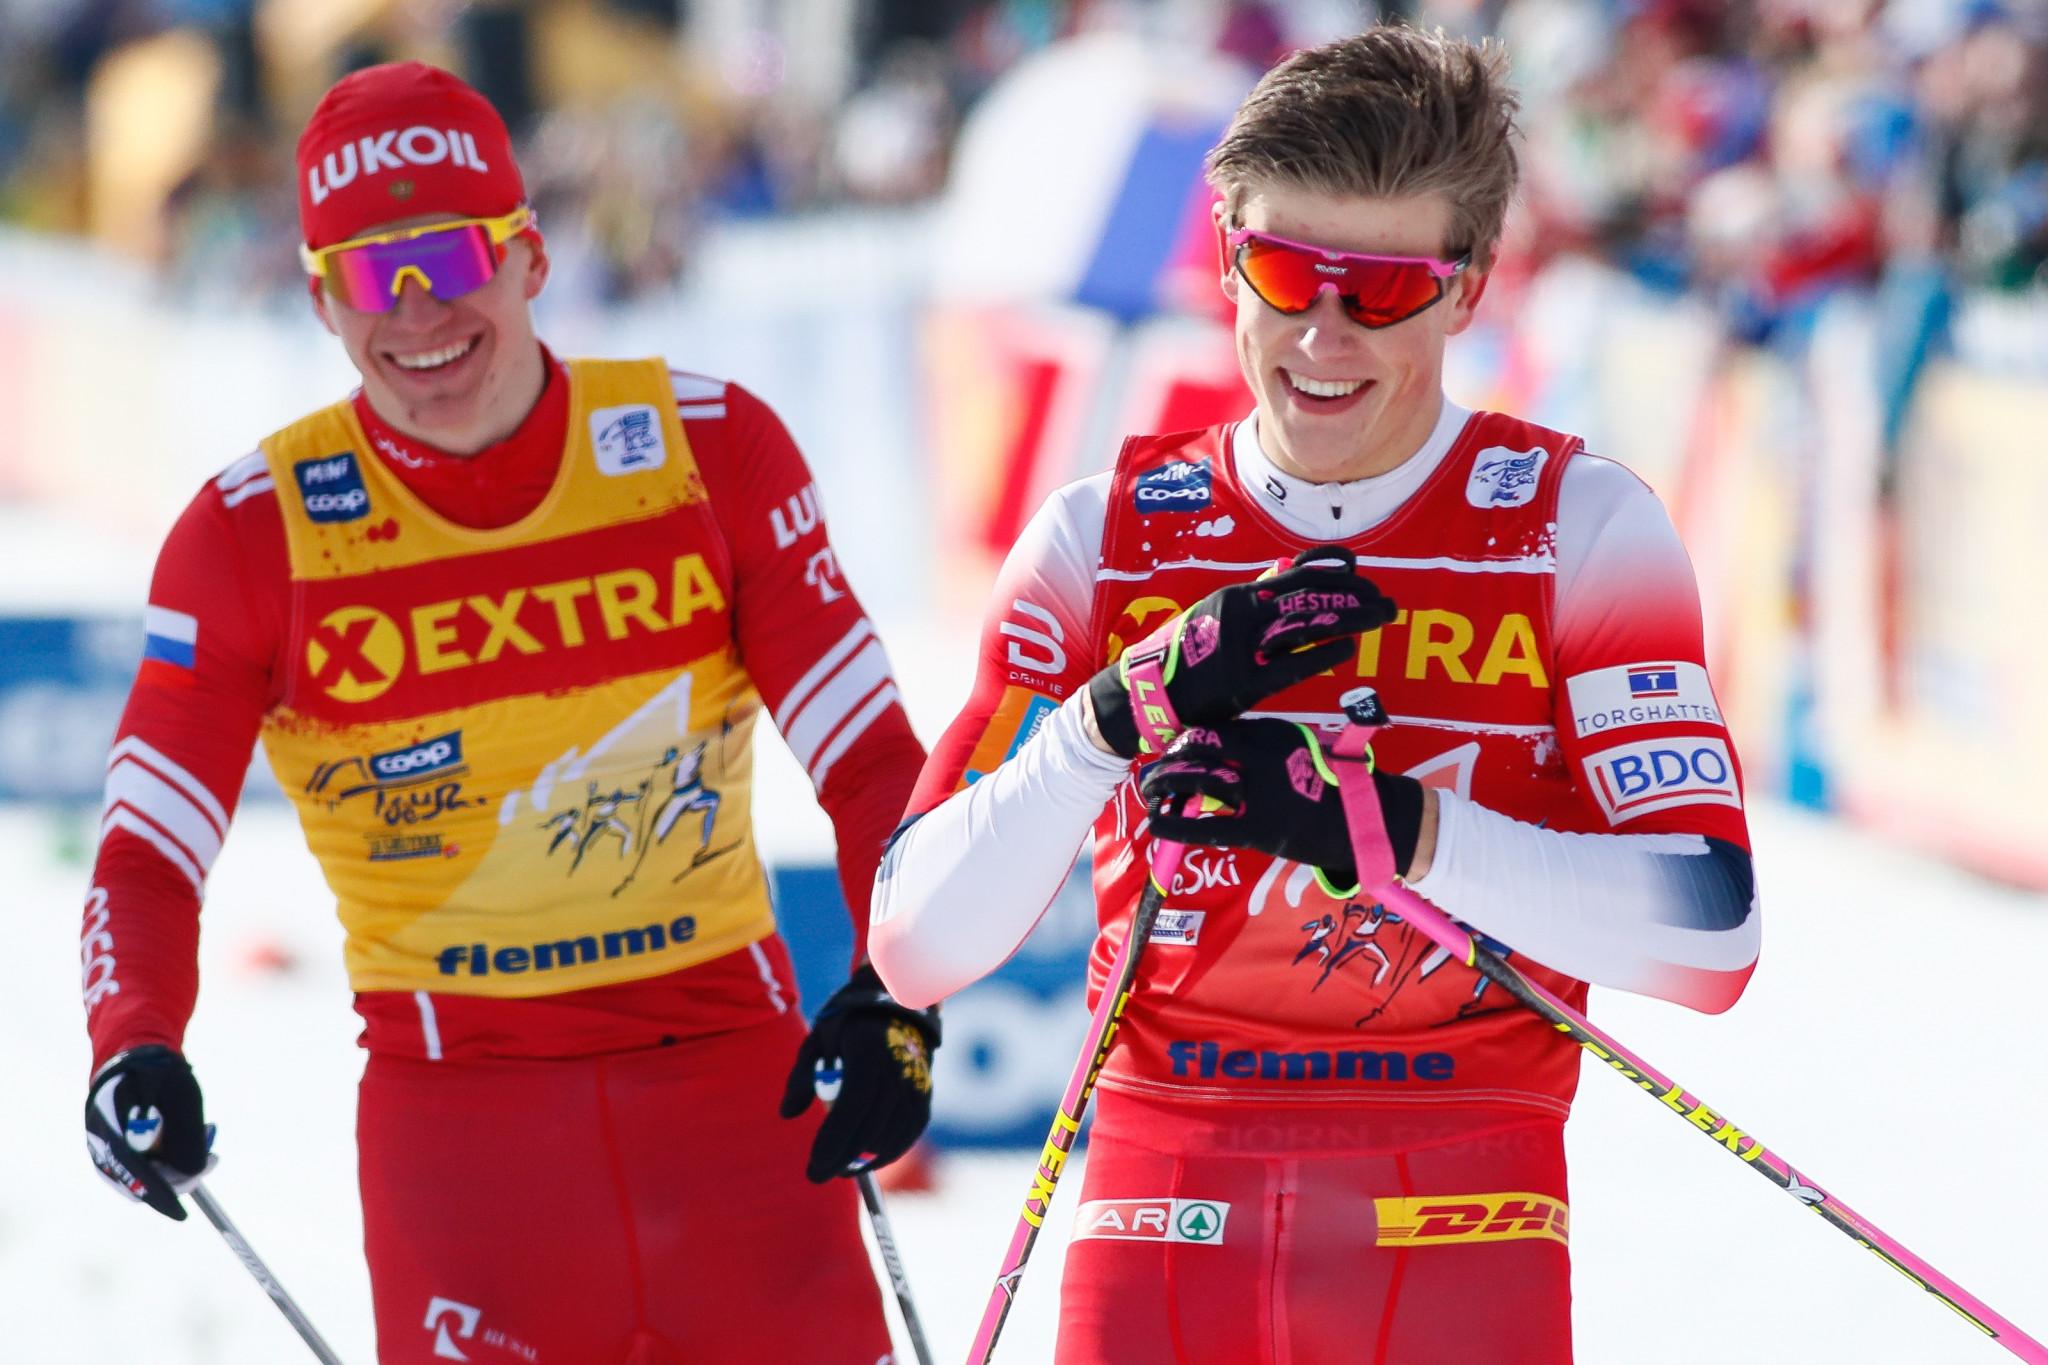 Klæbo edges into overall Tour de Ski lead with second grand final win in Val di Fiemme